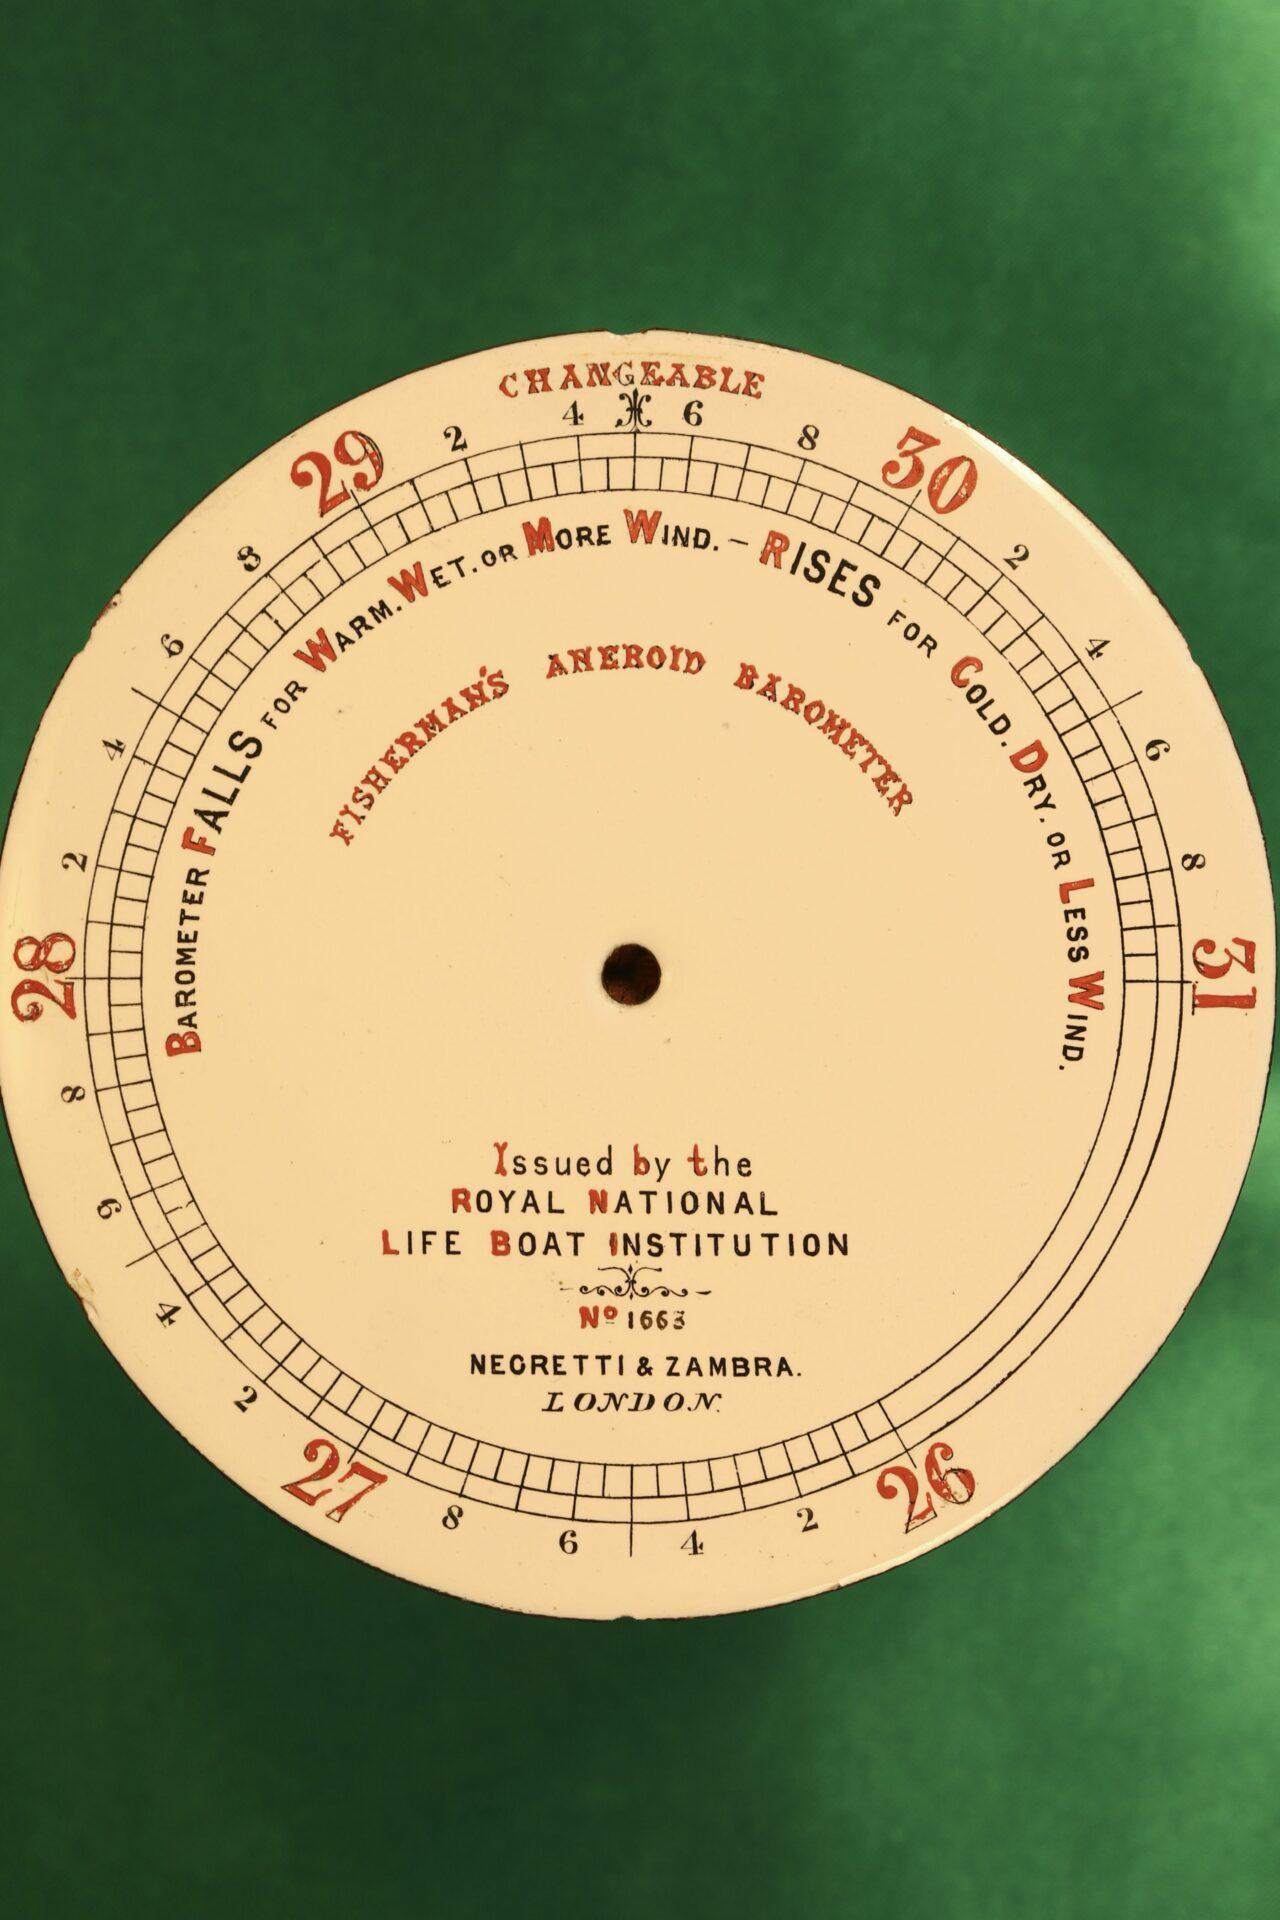 Image of dial from Negretti & Zambra RNLI Fishermans Aneroid Barometer No 1663